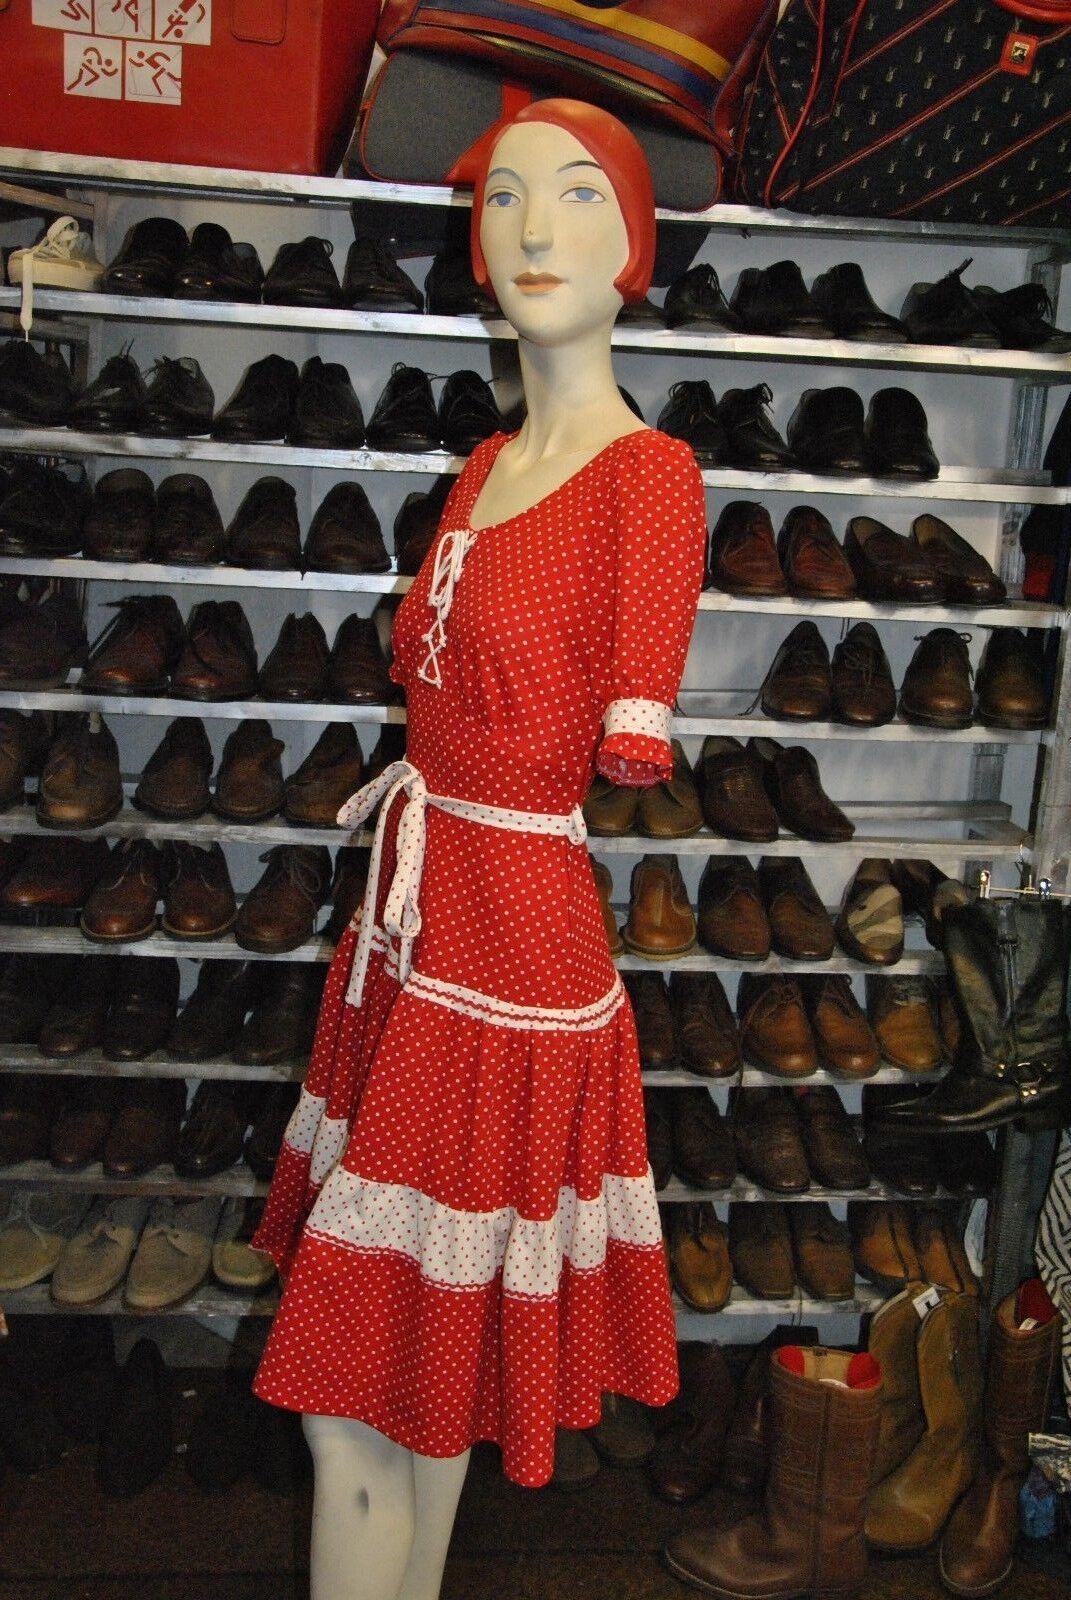 Diolen Kleid 36 rot polka dot gepunktet S TRUE VINTAGE VINTAGE VINTAGE 70s rot dress   Attraktive Mode    Neues Produkt  66eaa5